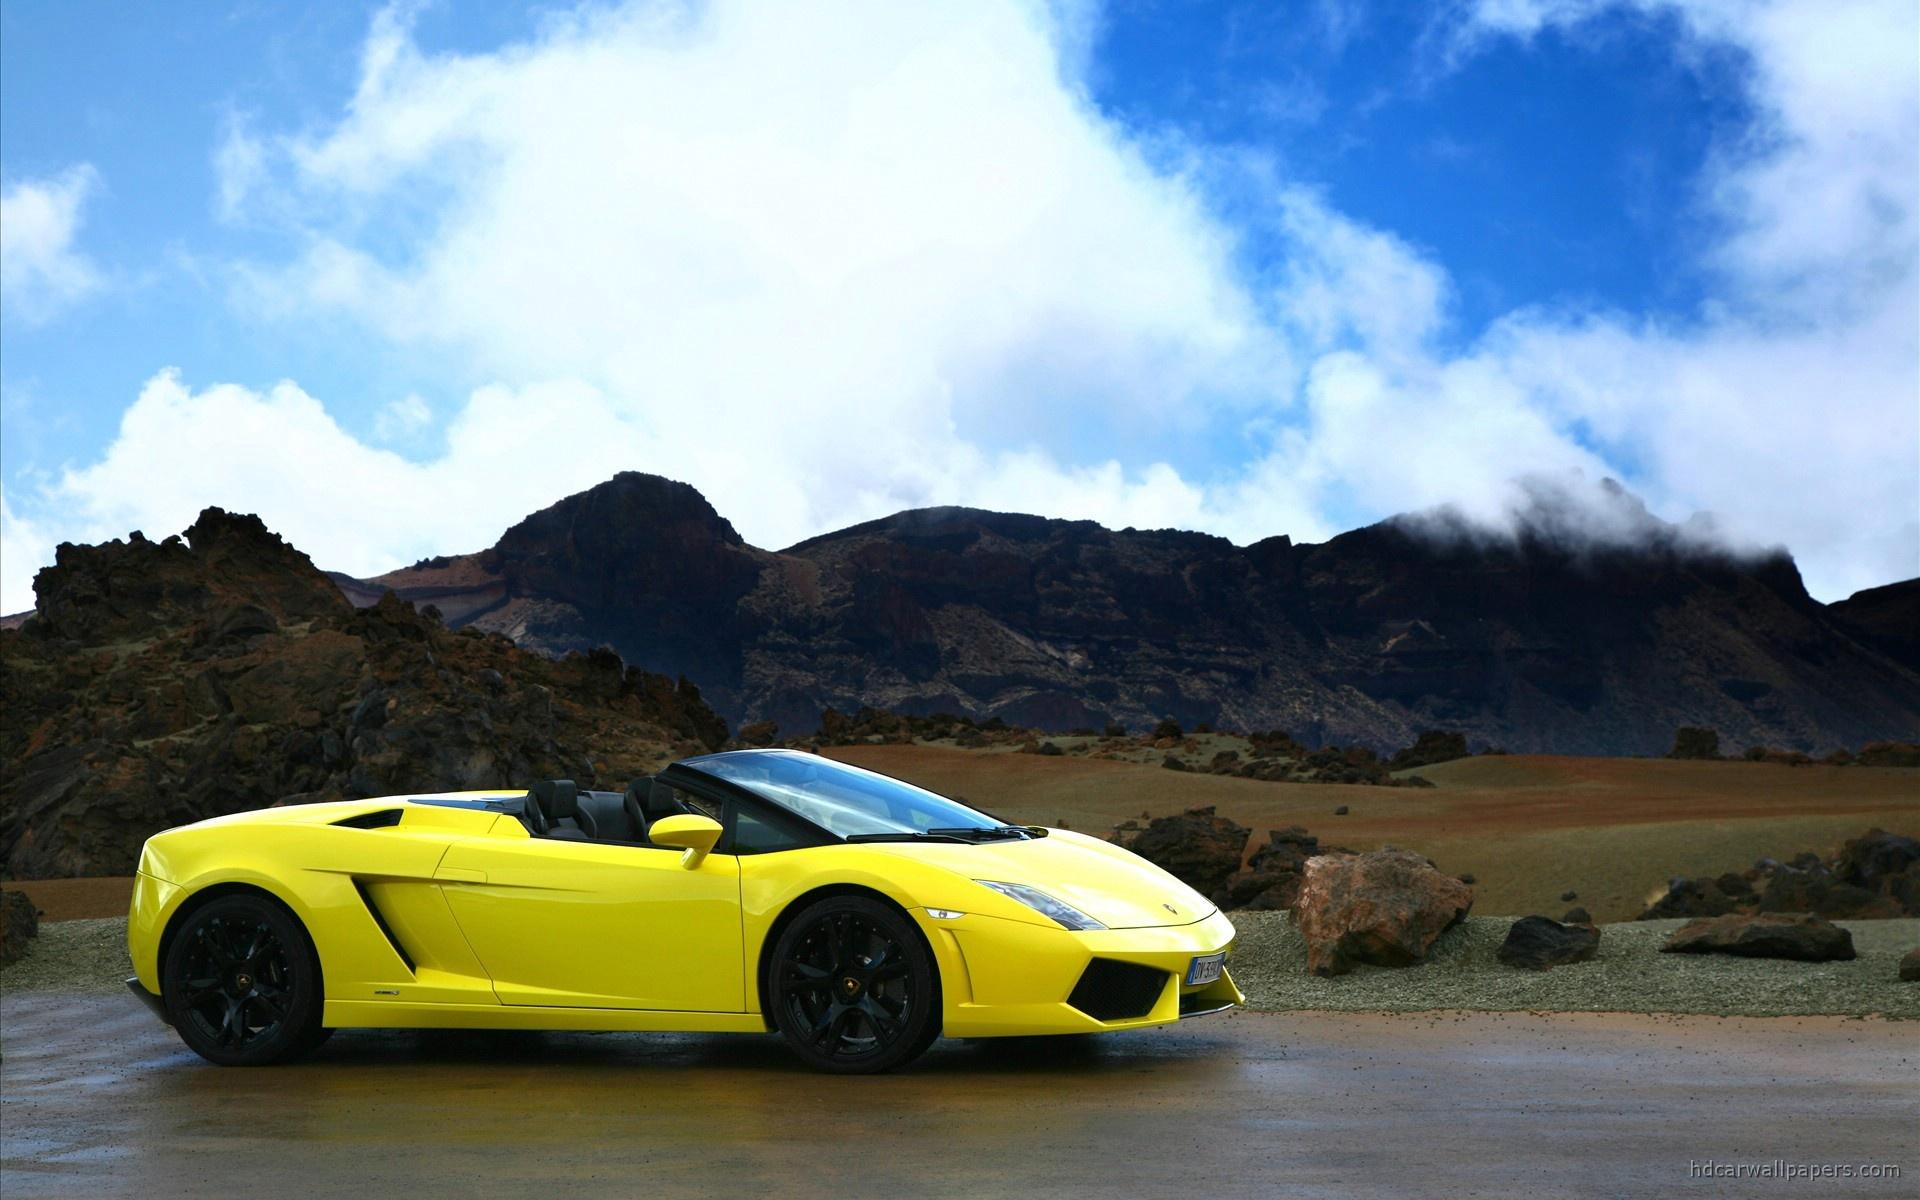 Cars Riccars Design Lamborghini Gallardo LP Police Car